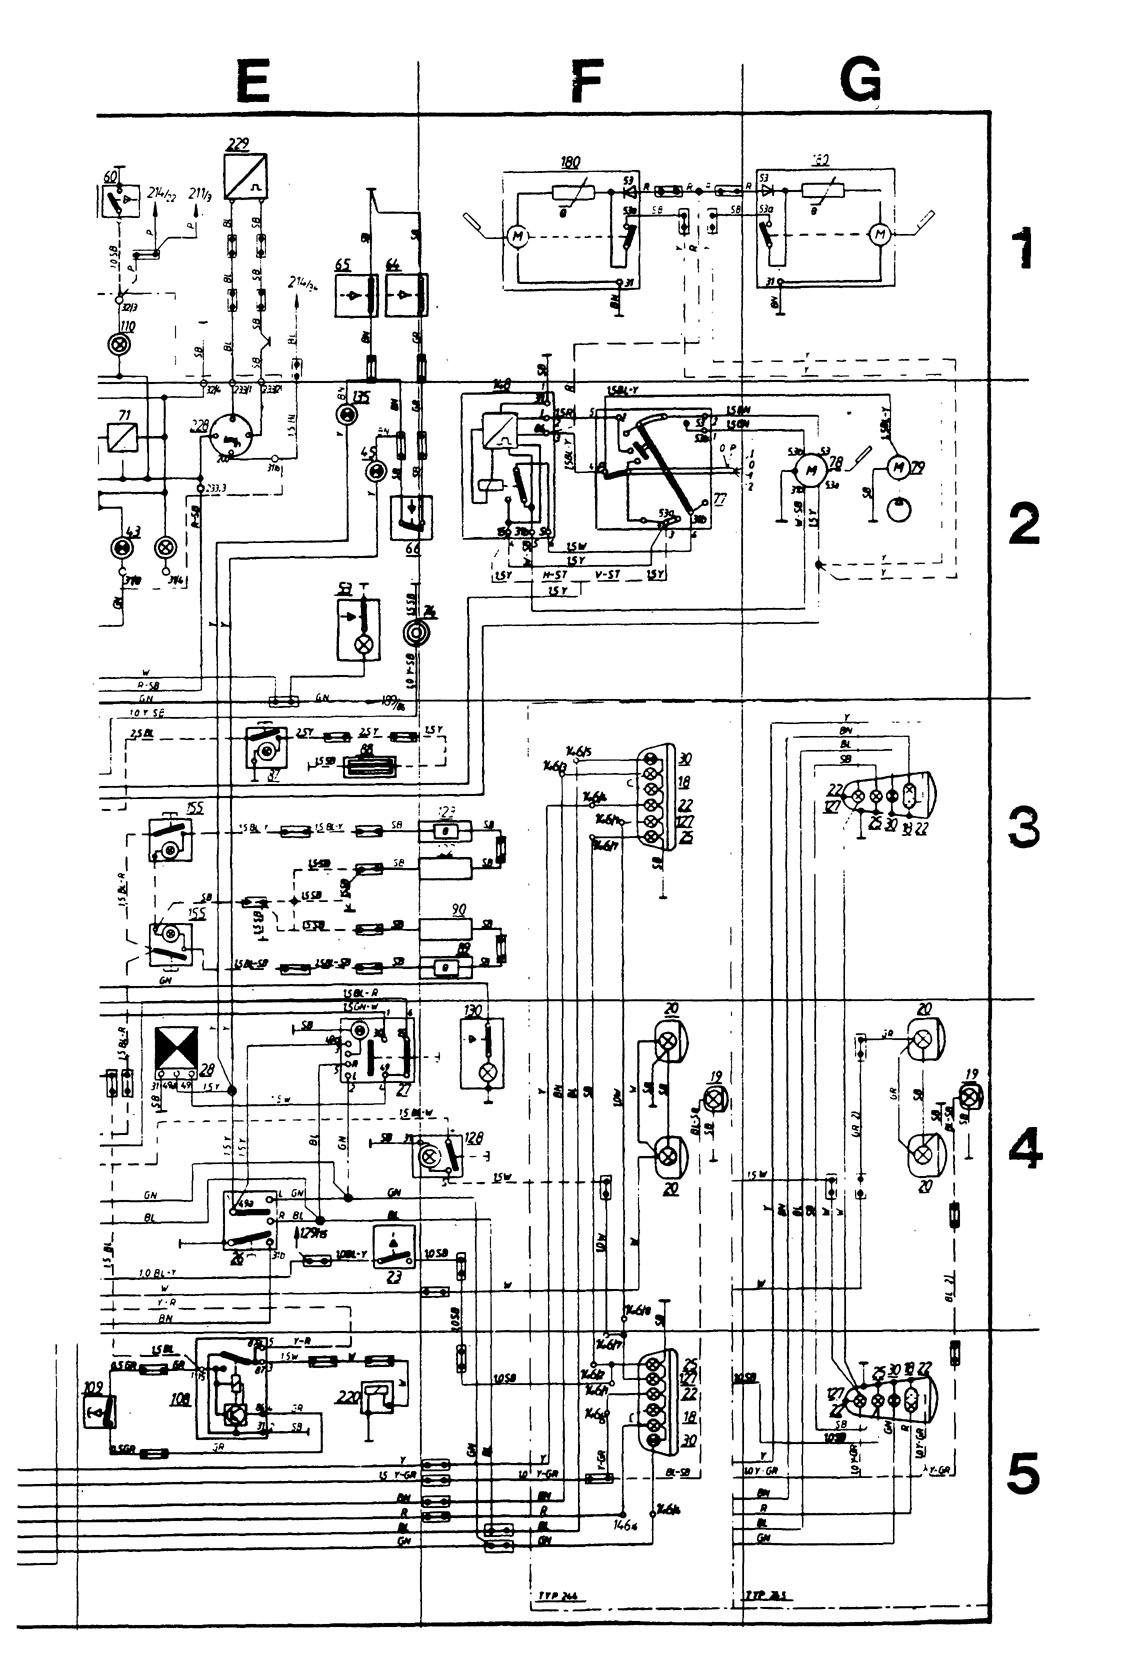 volvo 240 wiring diagram 1989 toro wheel horse 264h 244 diagrams instrumentation